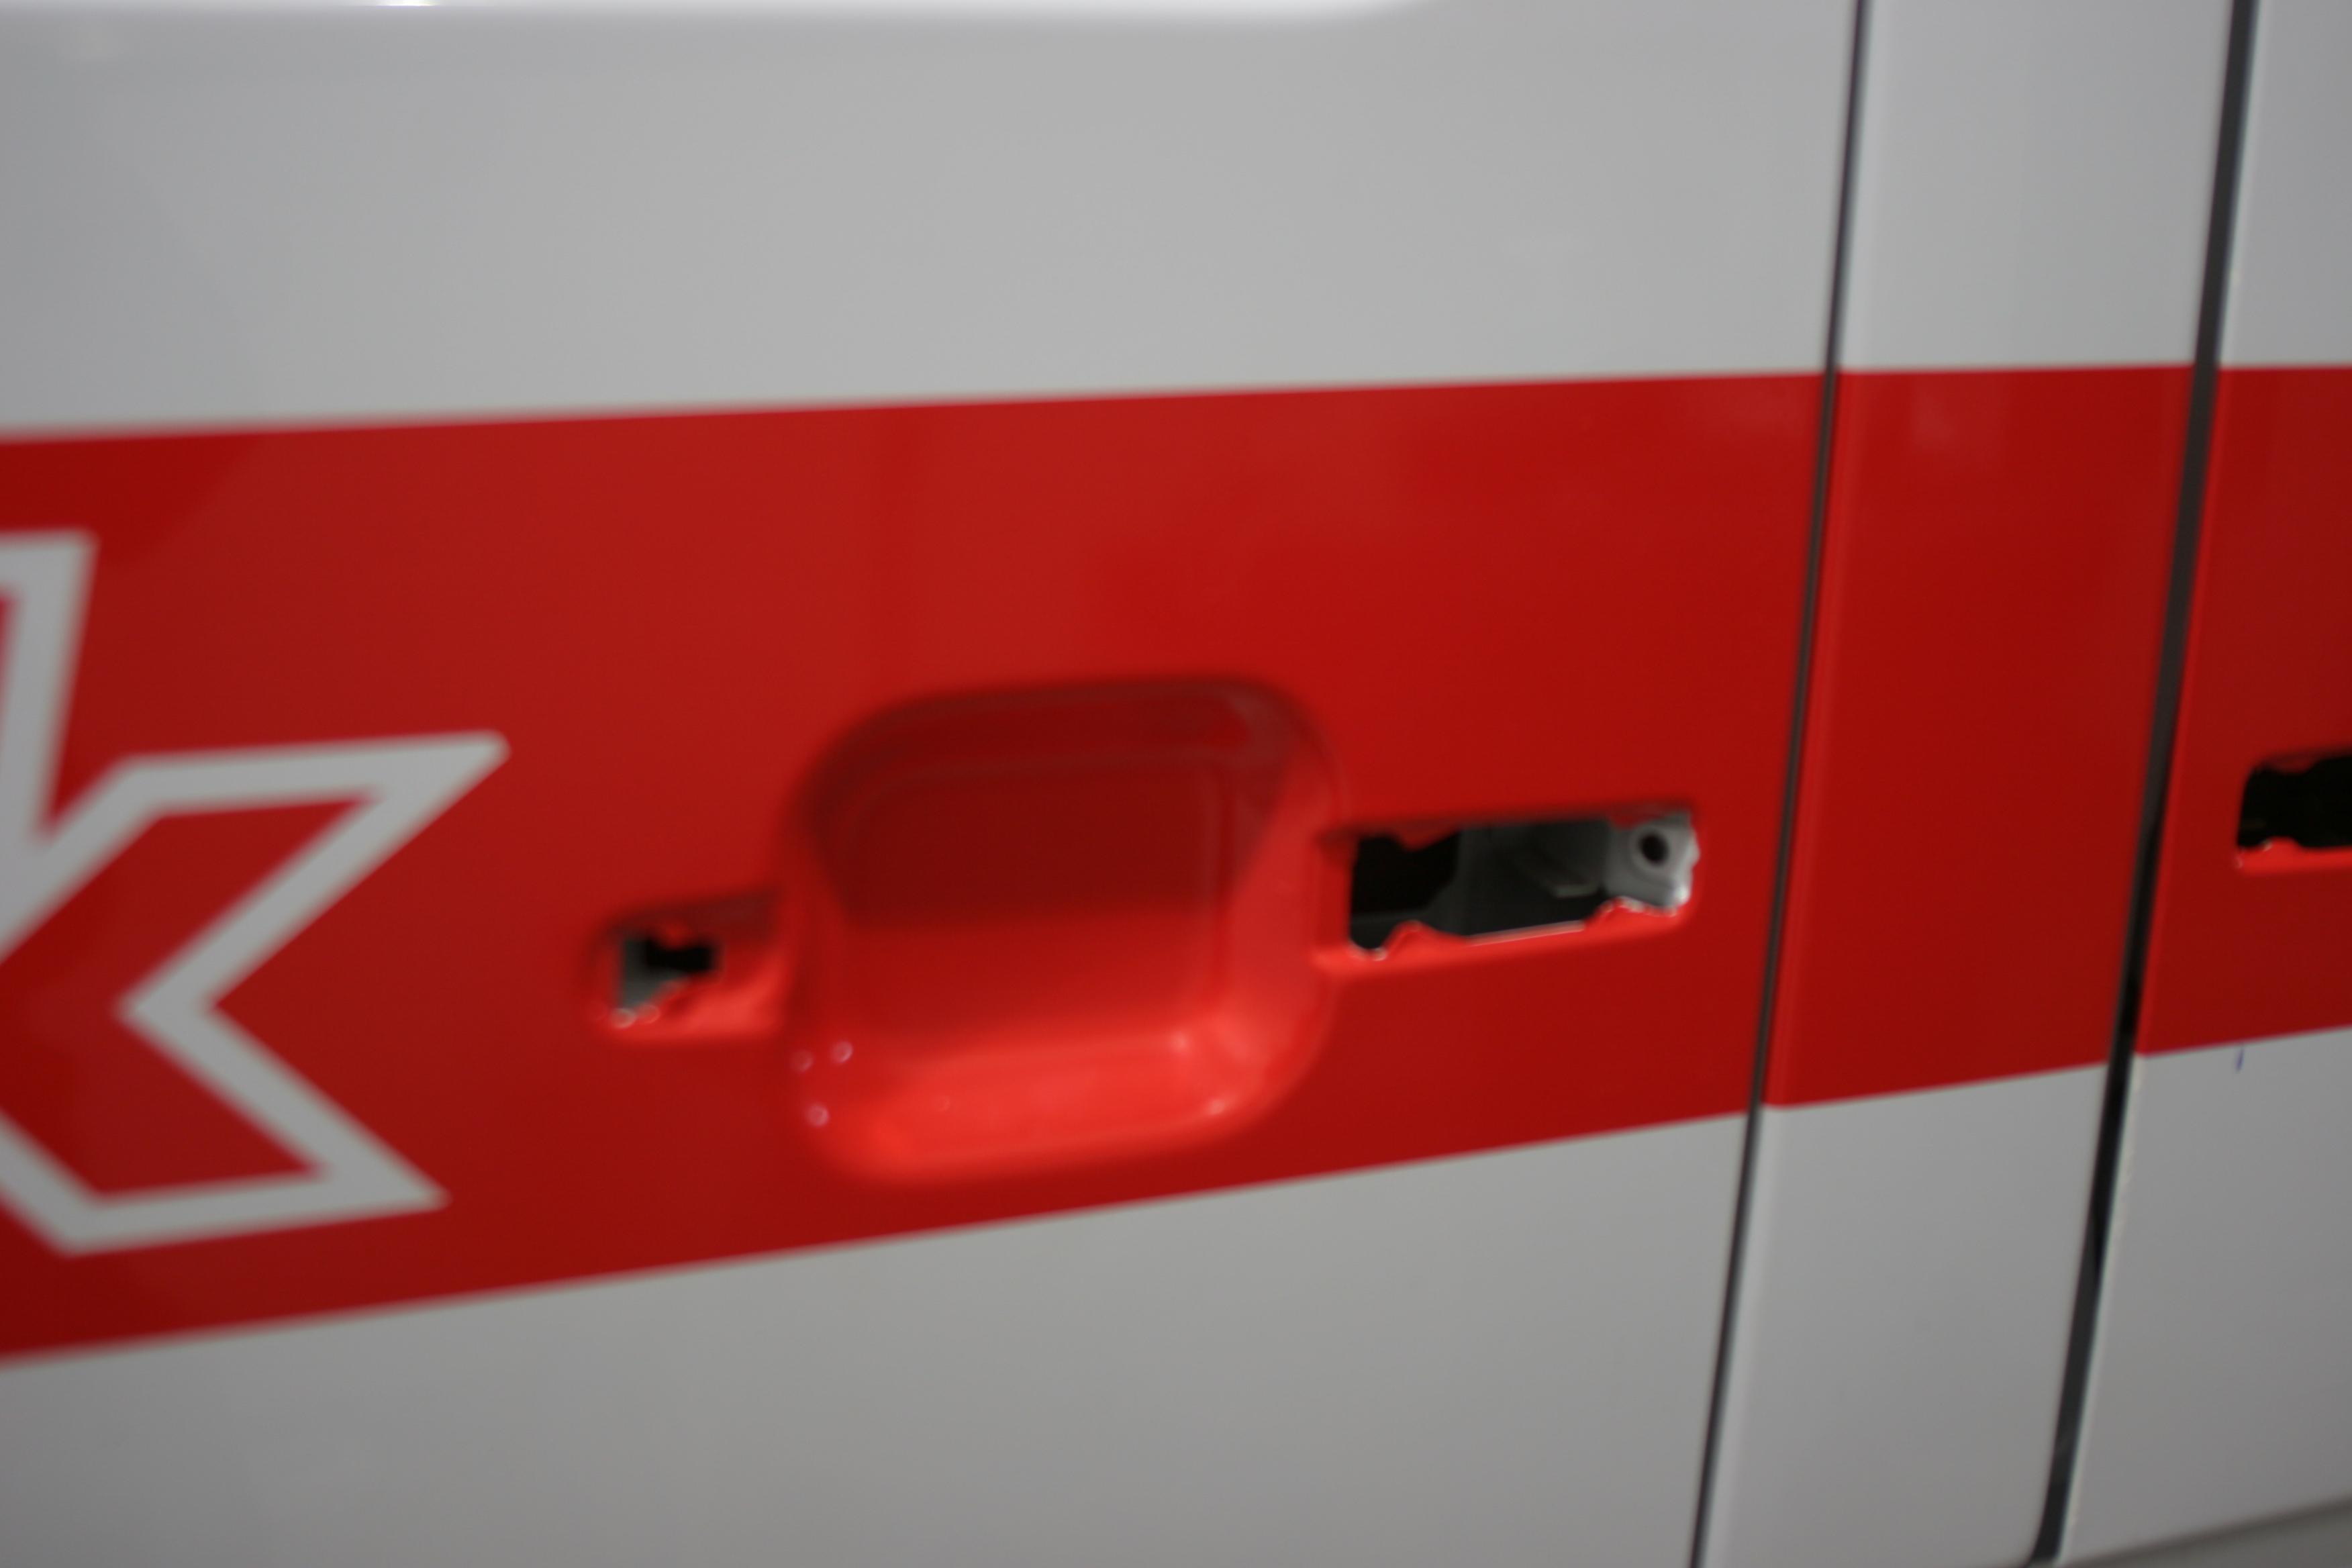 Fahrzeugbeschriftung 7 fahrzeugbeschriftung Fahrzeugbeschriftung Fahrzeugbeschriftung 25